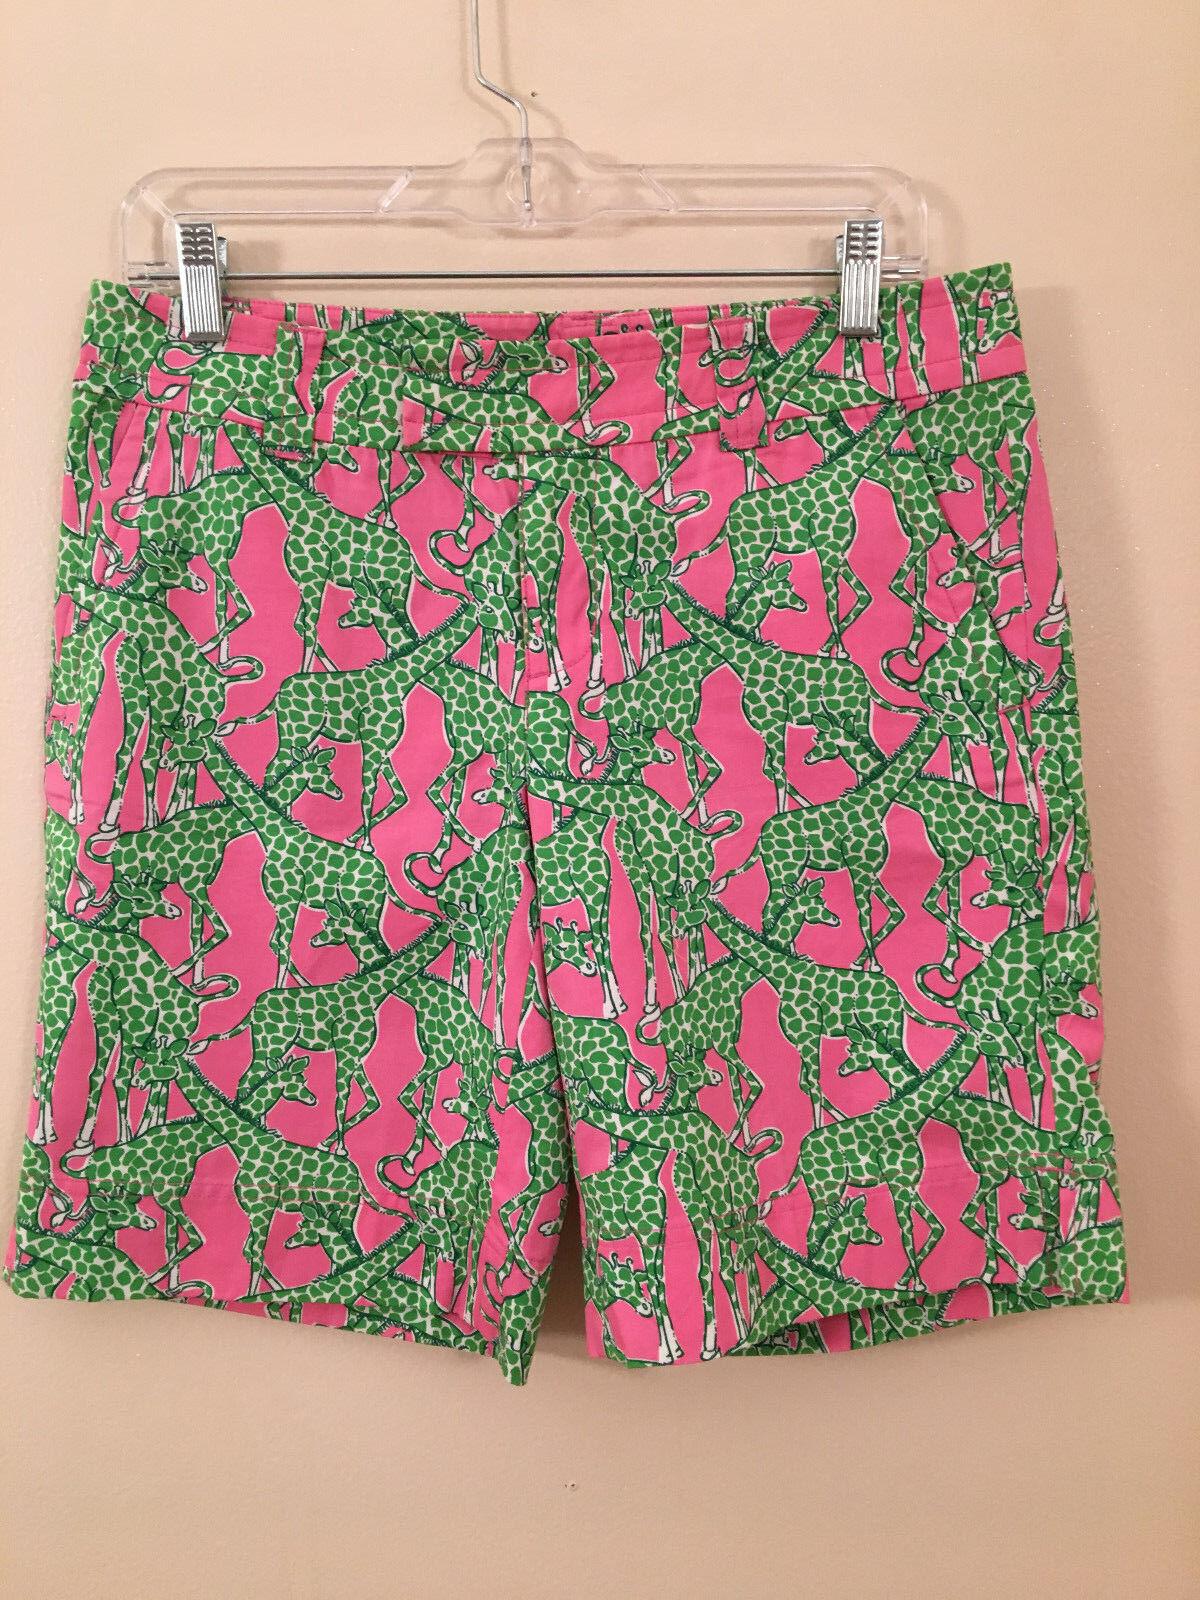 Pink Green LILLY PULITZER Giraffe Print PALM BEACH FIT Summer Bermuda Shorts - 4